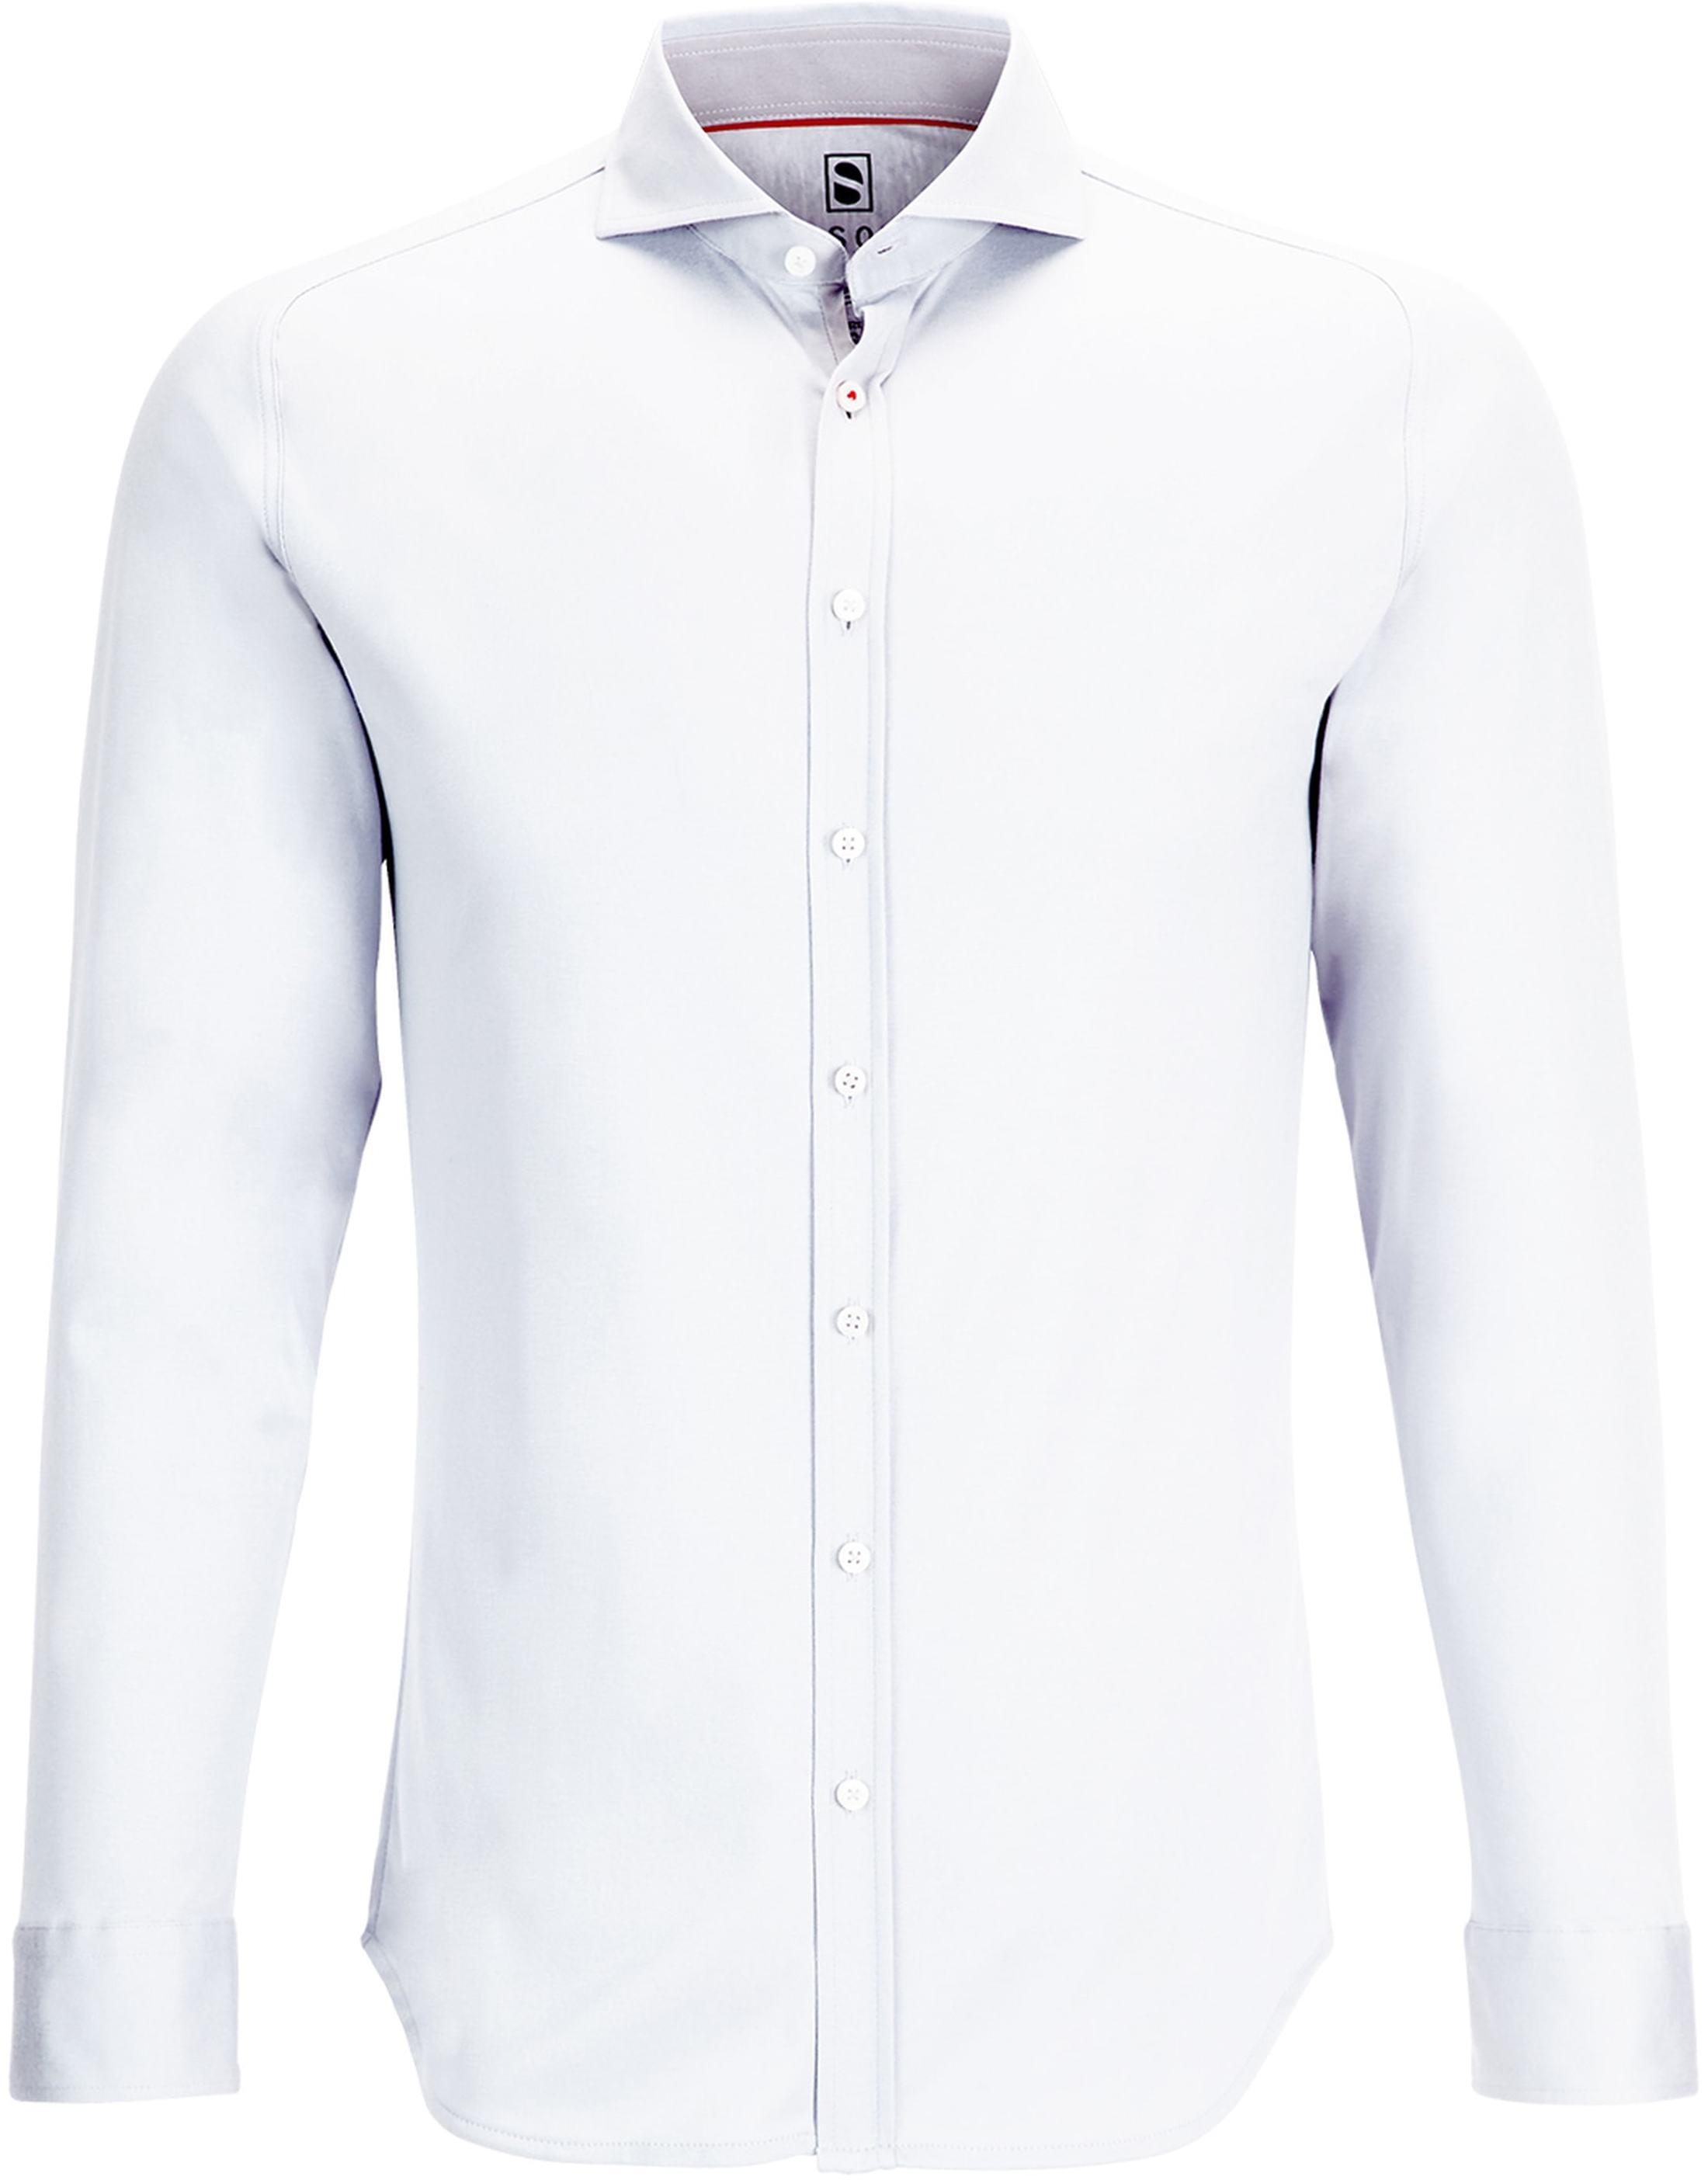 Desoto Overhemd Strijkvrij Wit foto 0